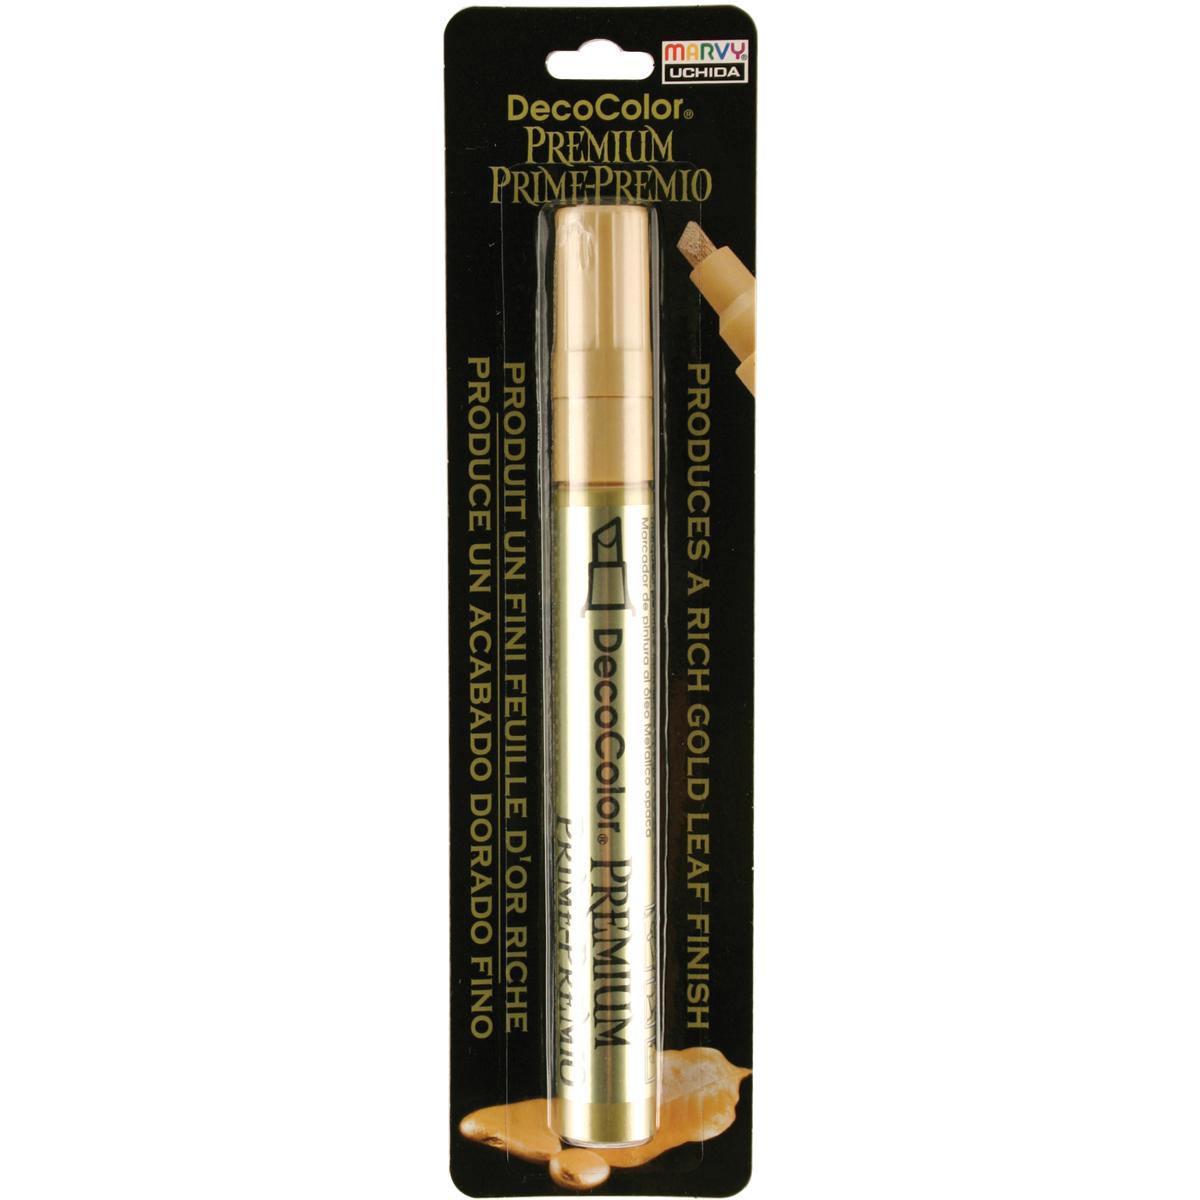 Uchida DecoColor Gold Marker